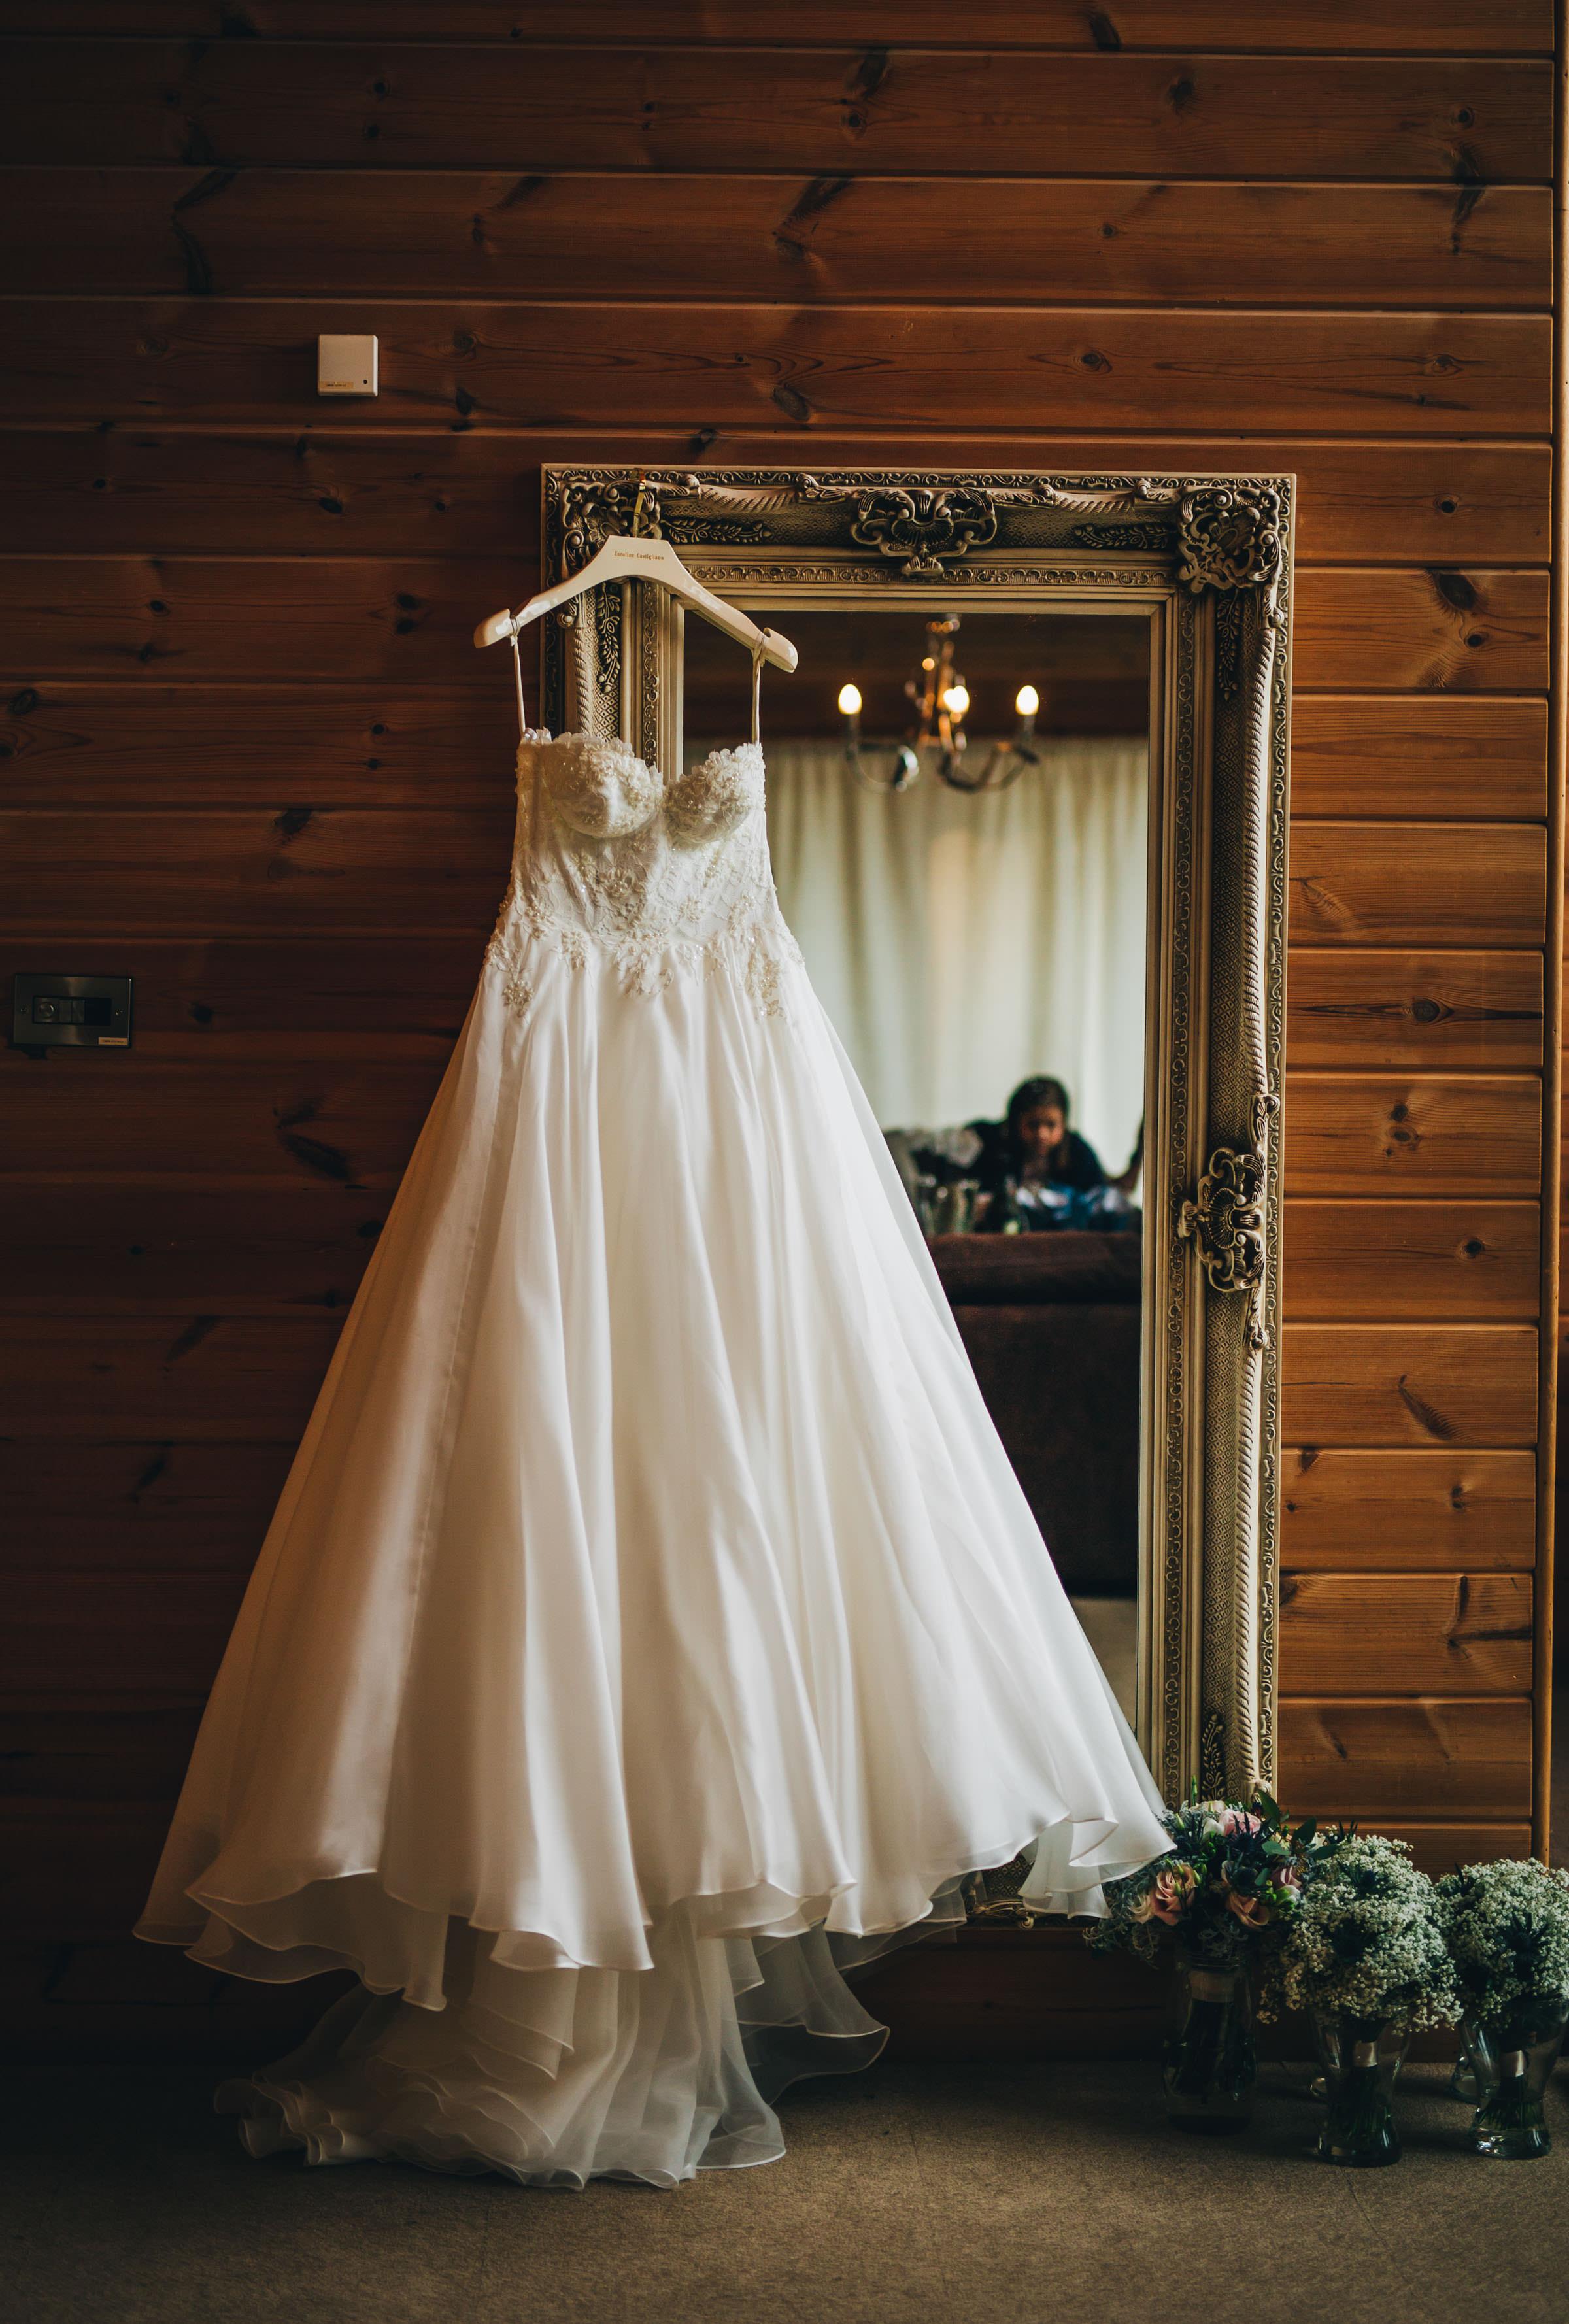 beautiful dress hanging at Styal Lodge